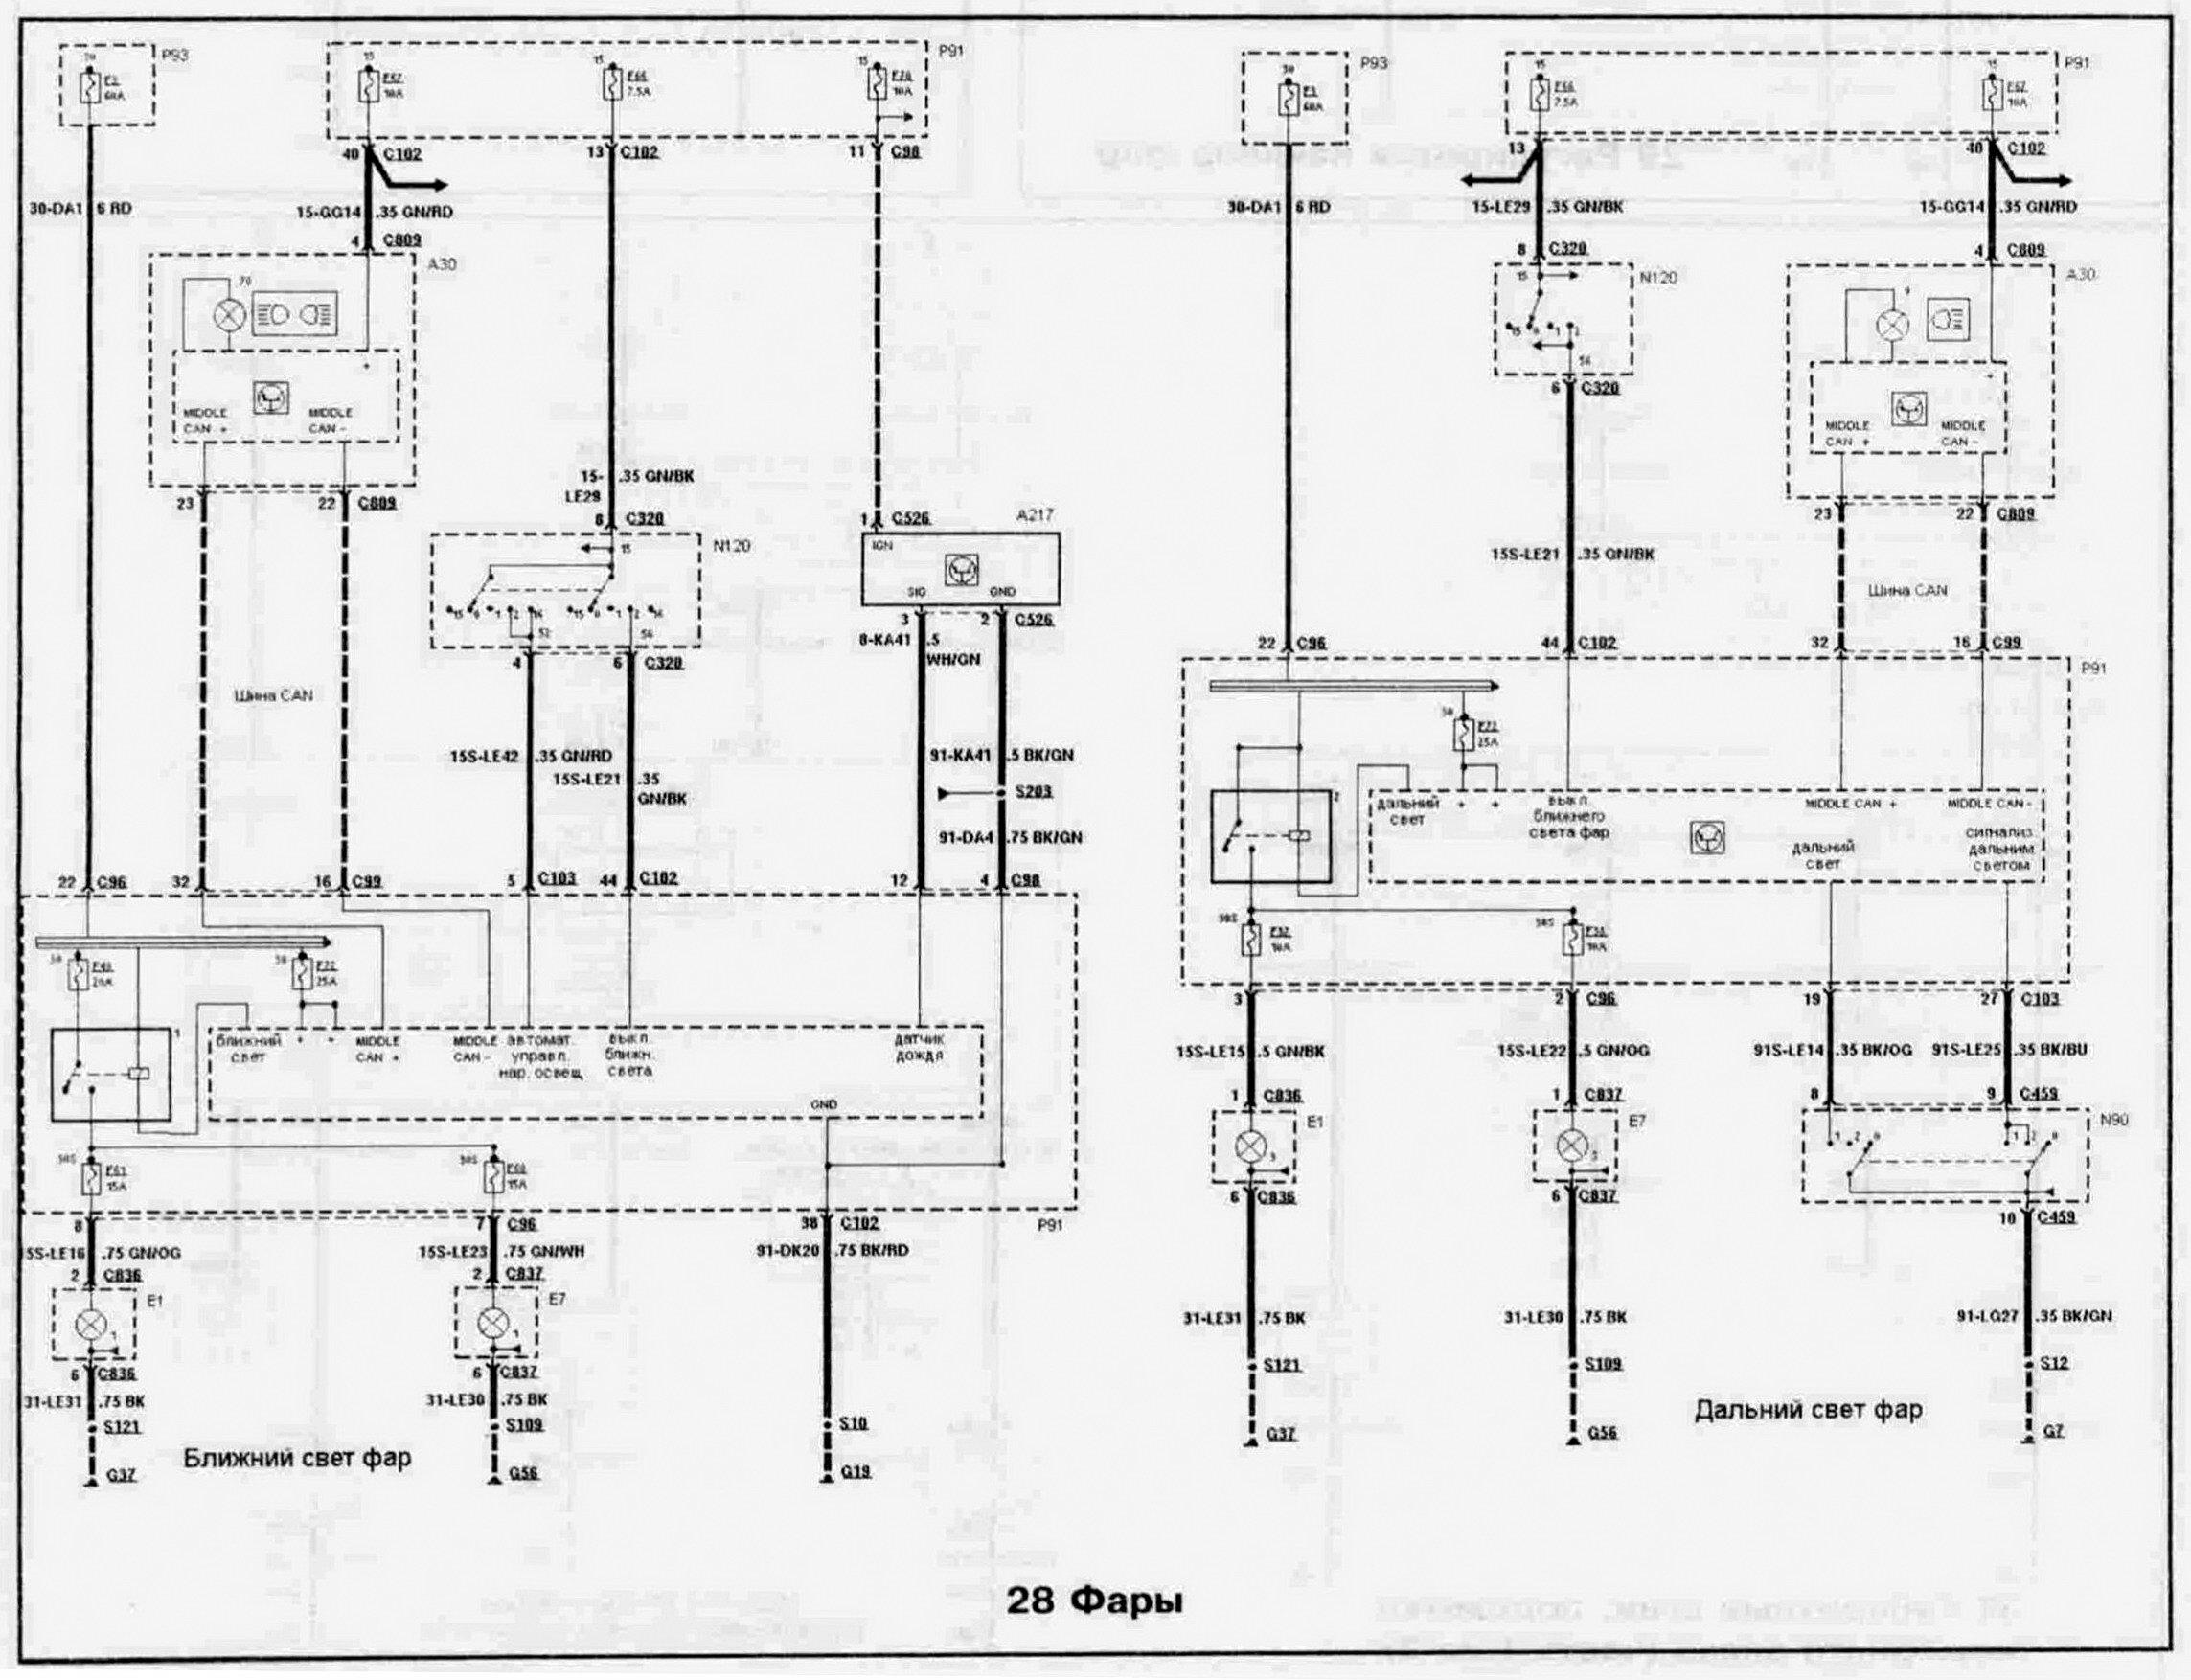 установка противотуманных фар ланос схема